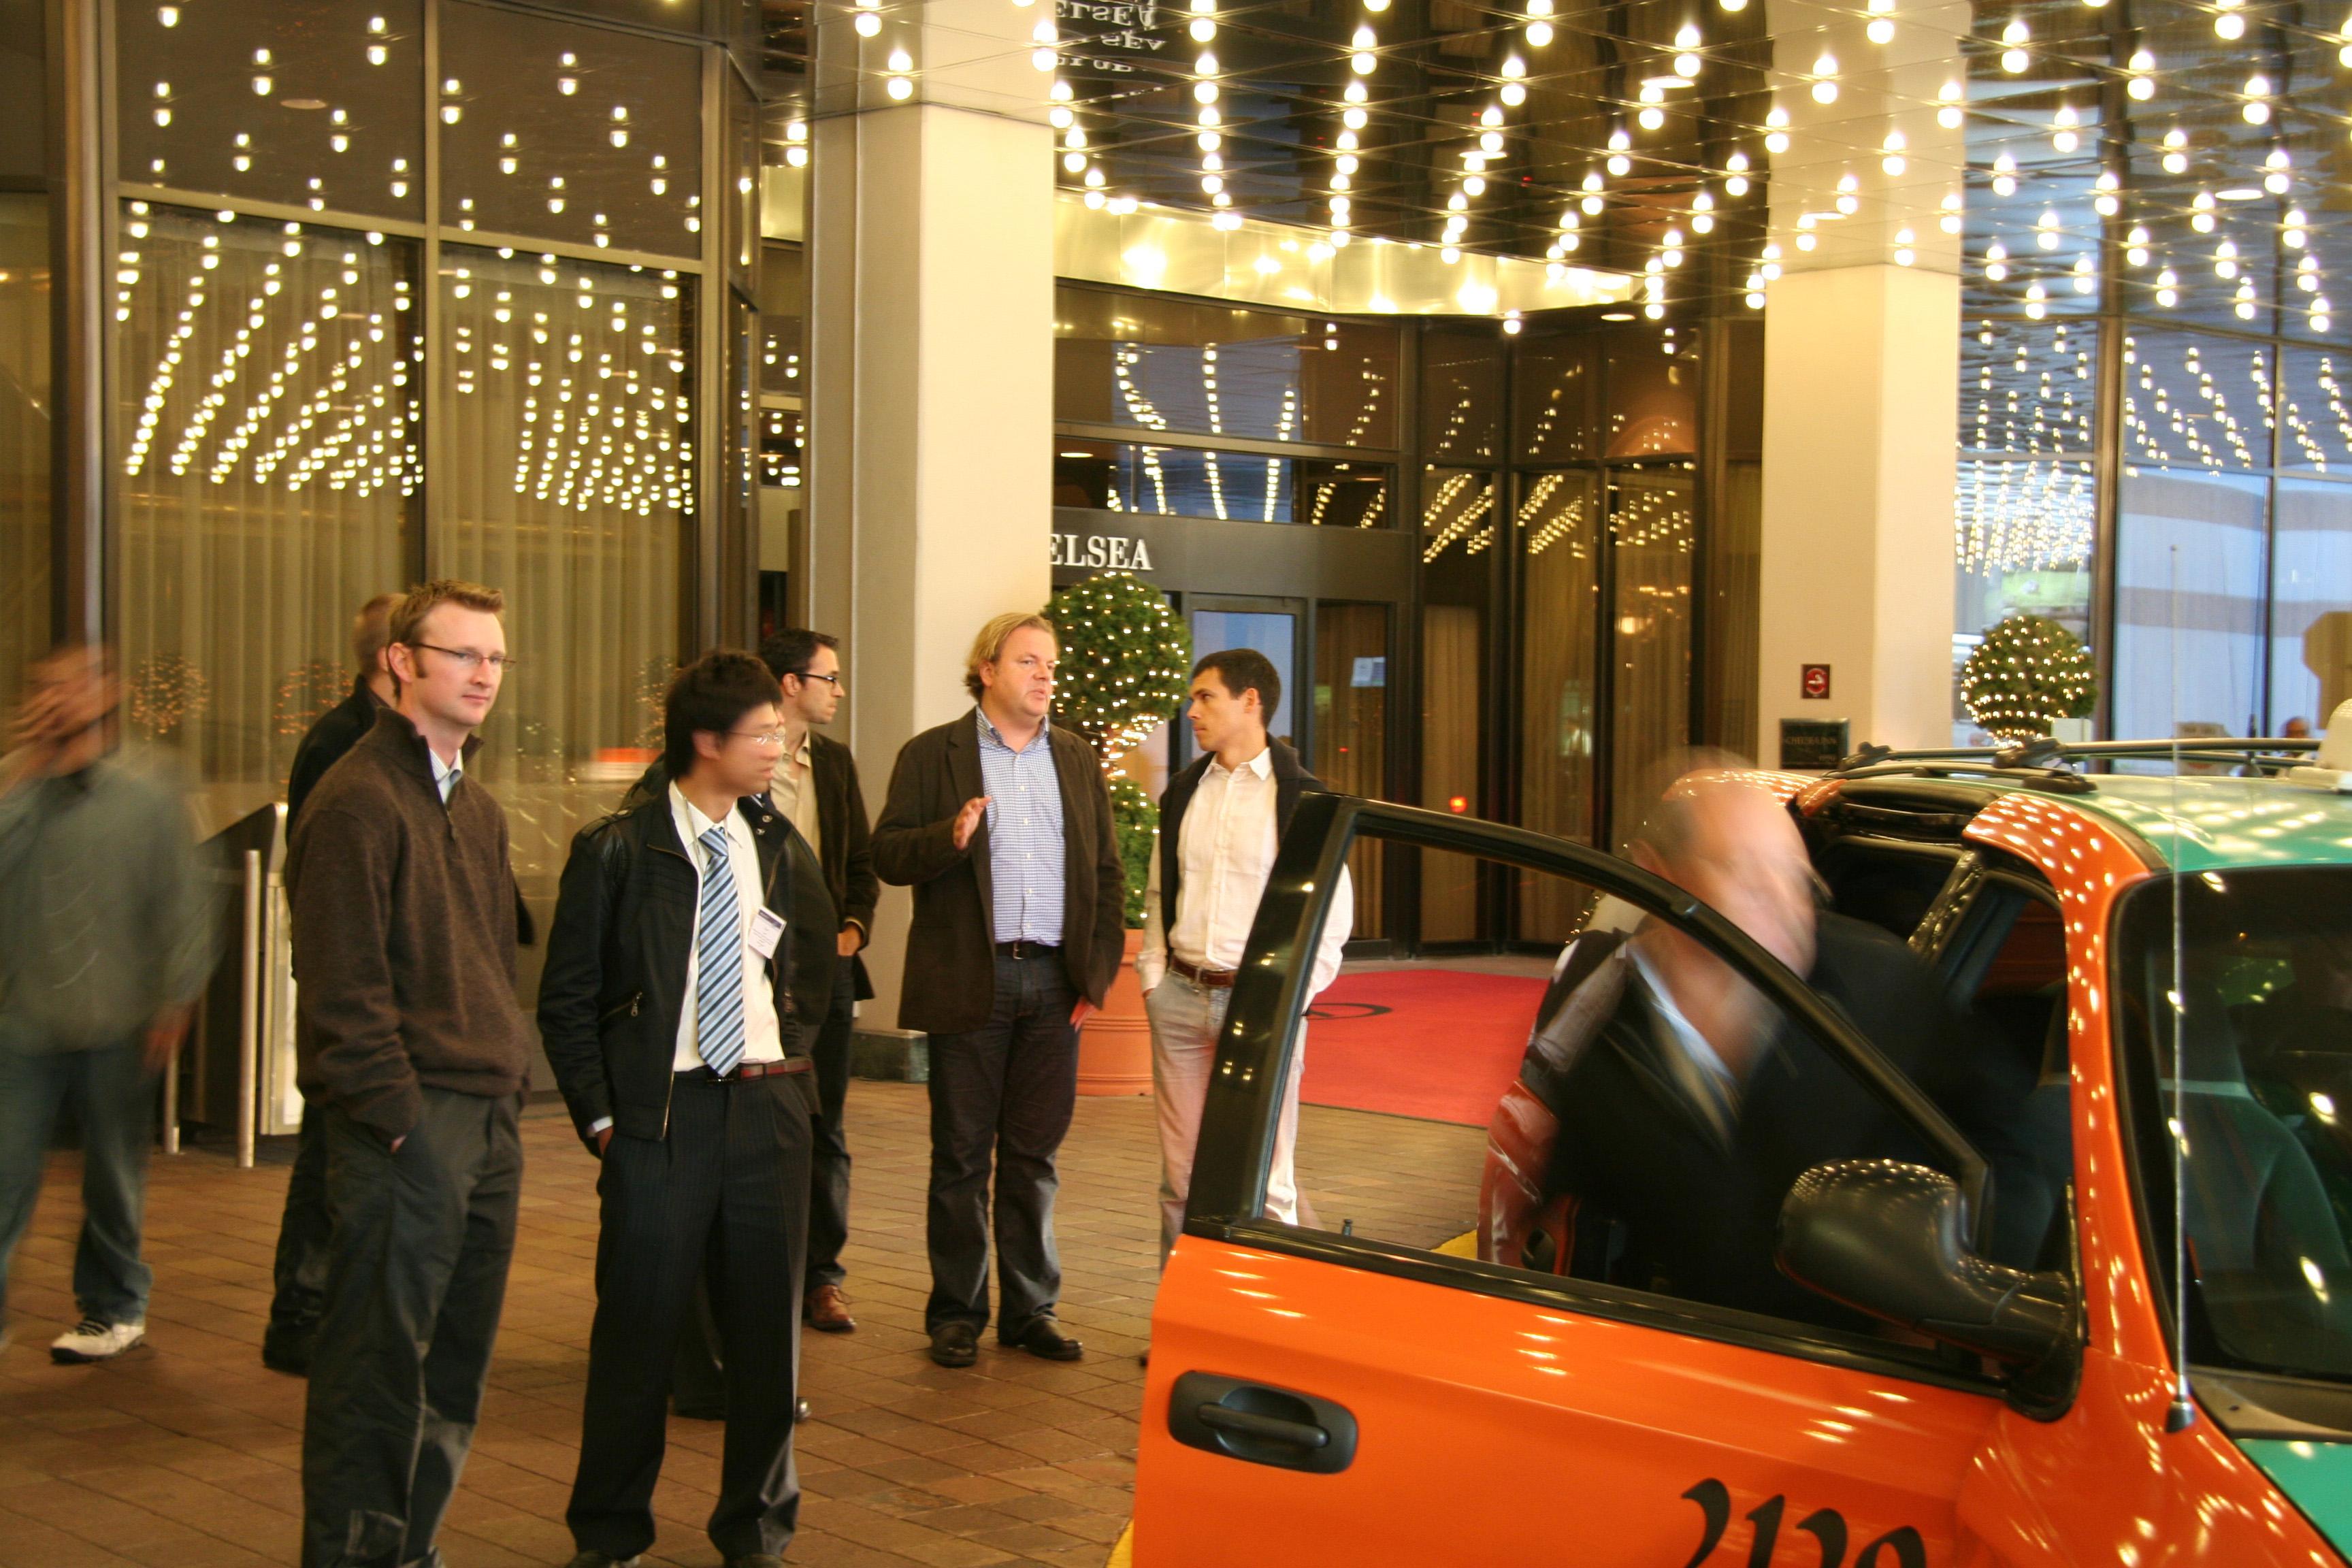 Delta Chelsea Hotel Toronto Telephone